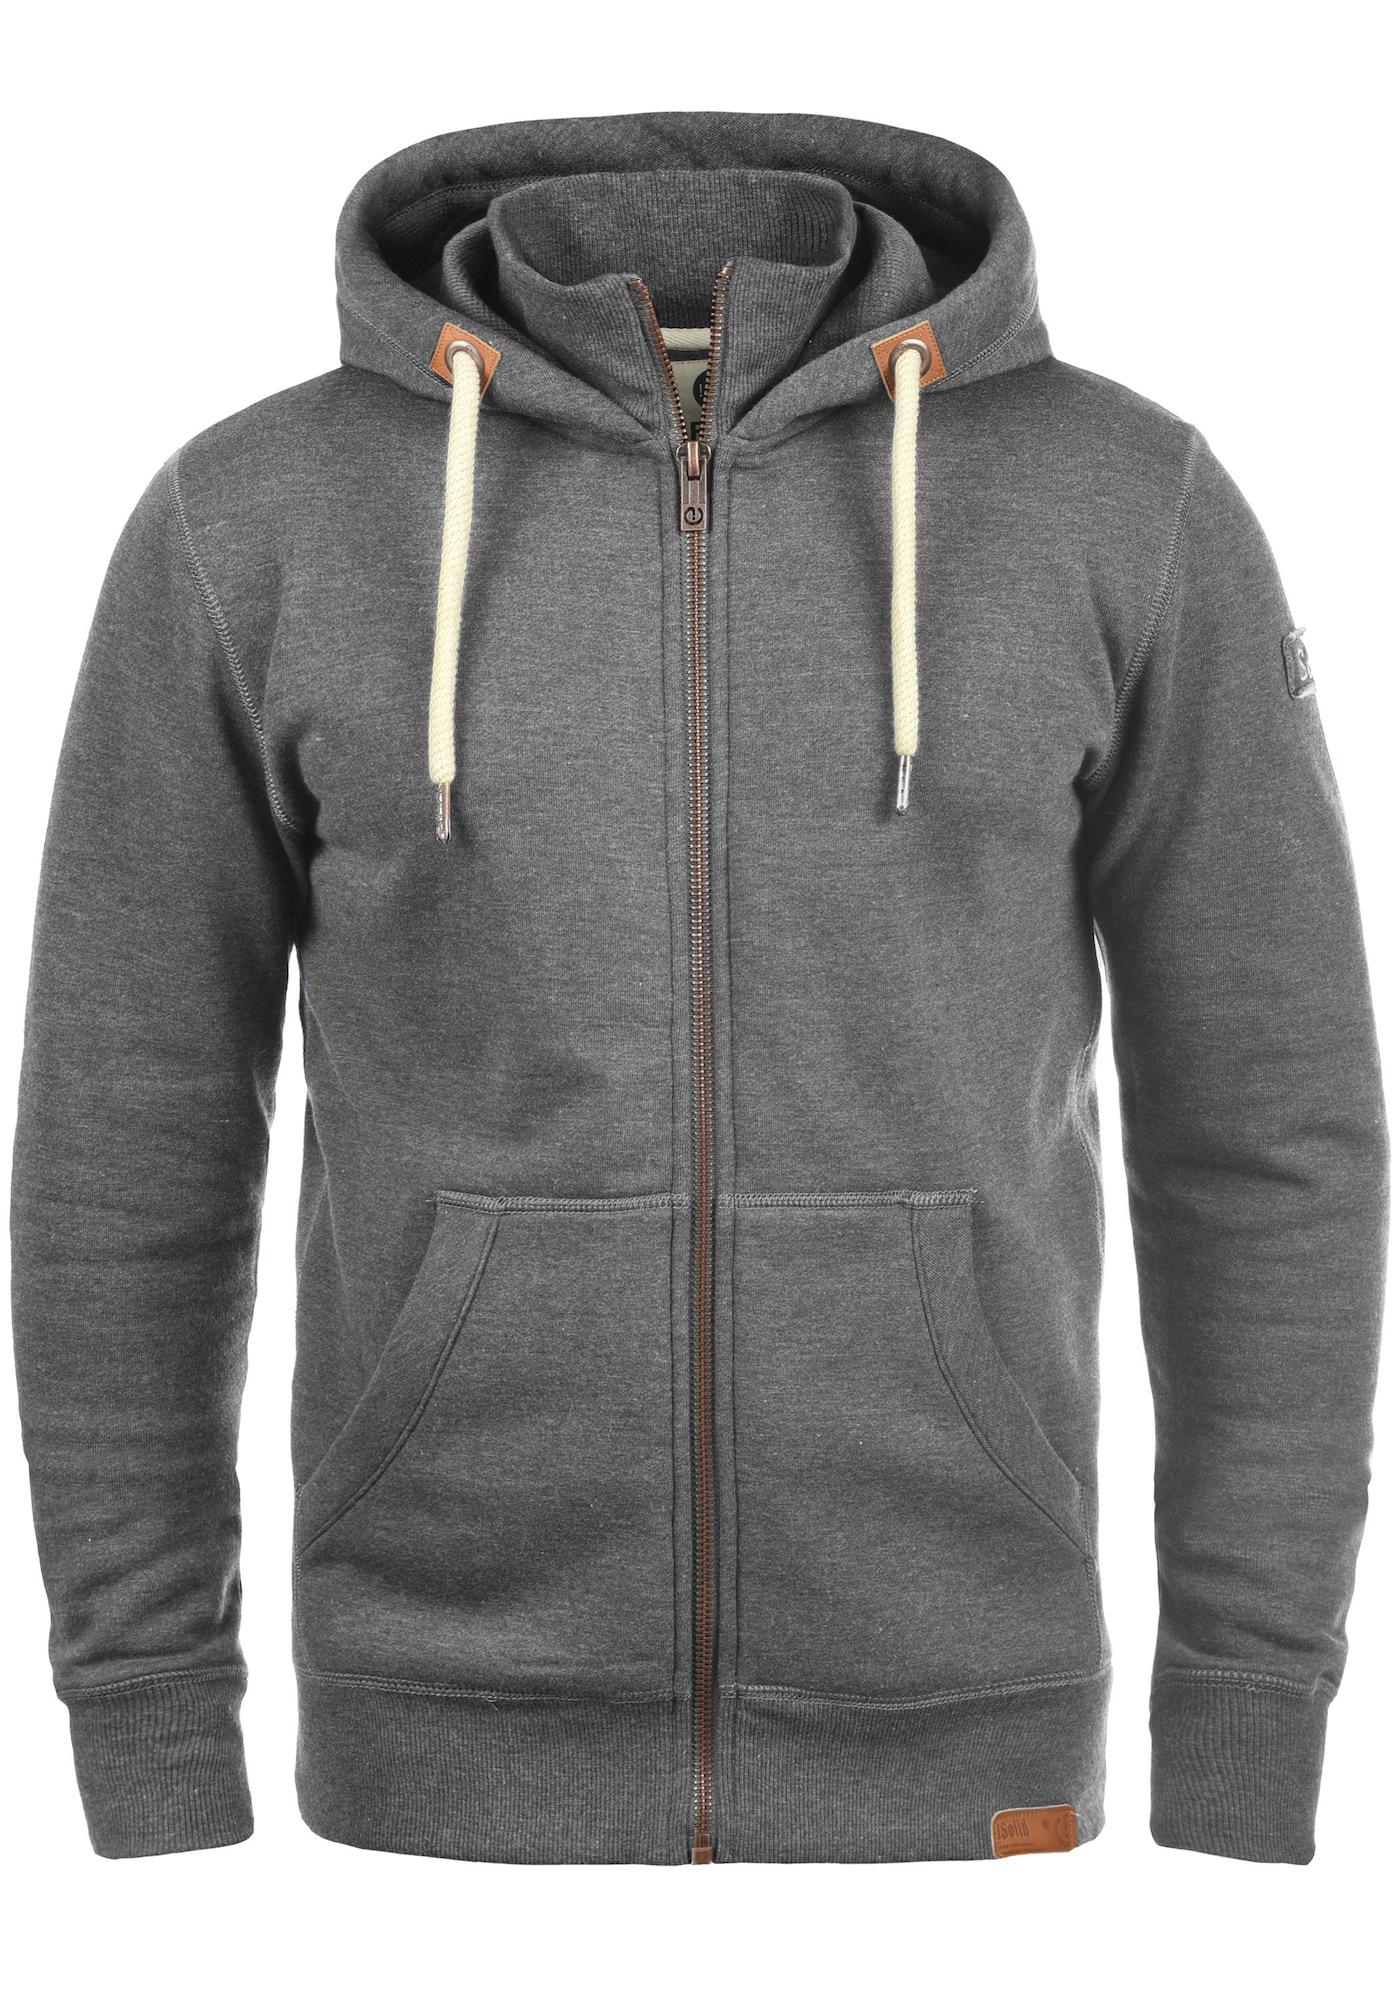 Kapuzensweatjacke 'TripZip' | Bekleidung > Sweatshirts & -jacken > Sweatjacken | Beige - Grau | !solid